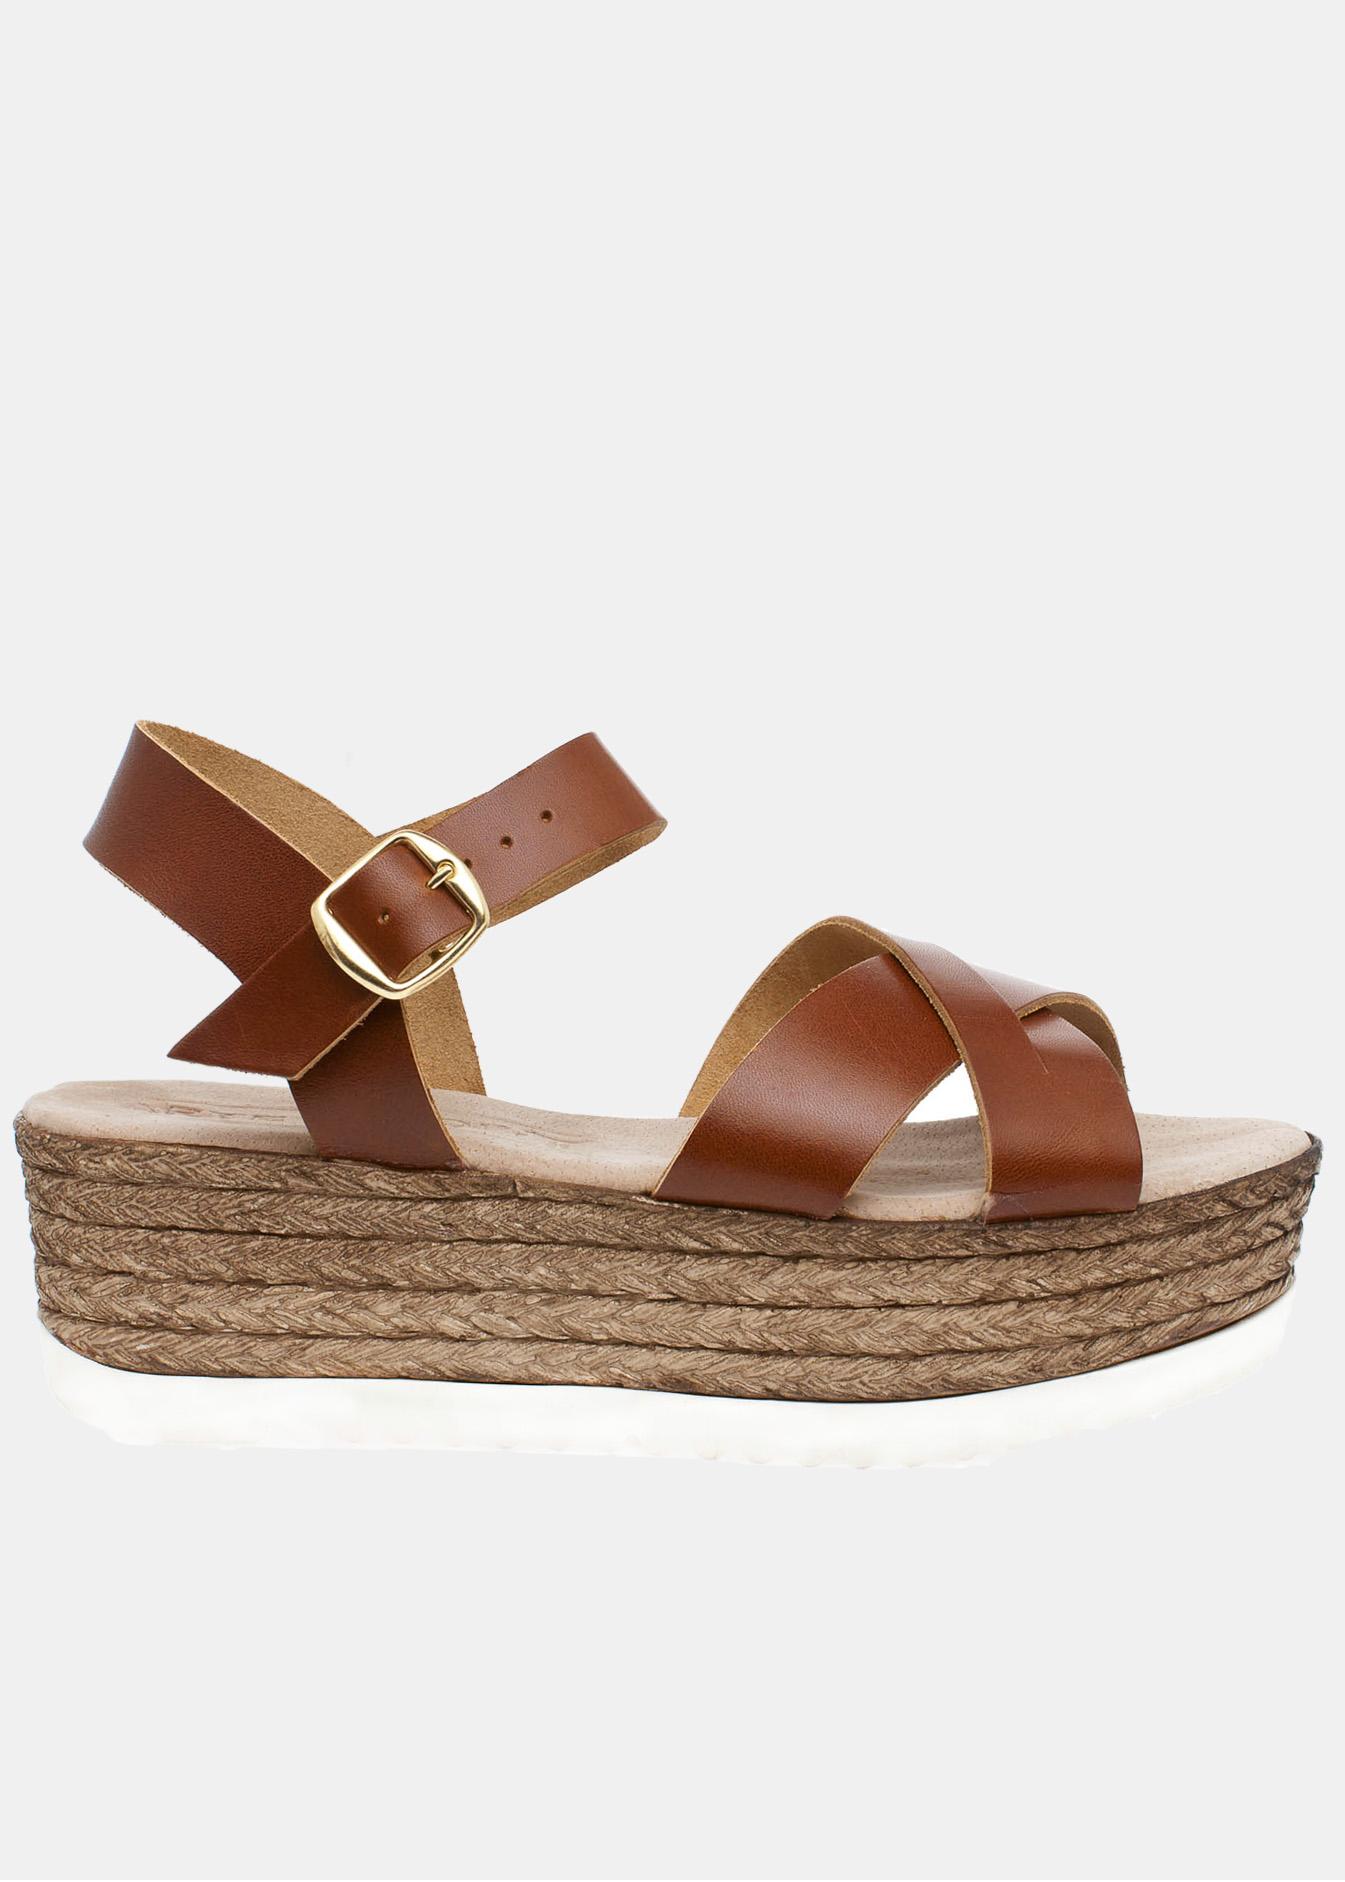 Olivia δερμάτινη flatform, καφέ παπούτσια